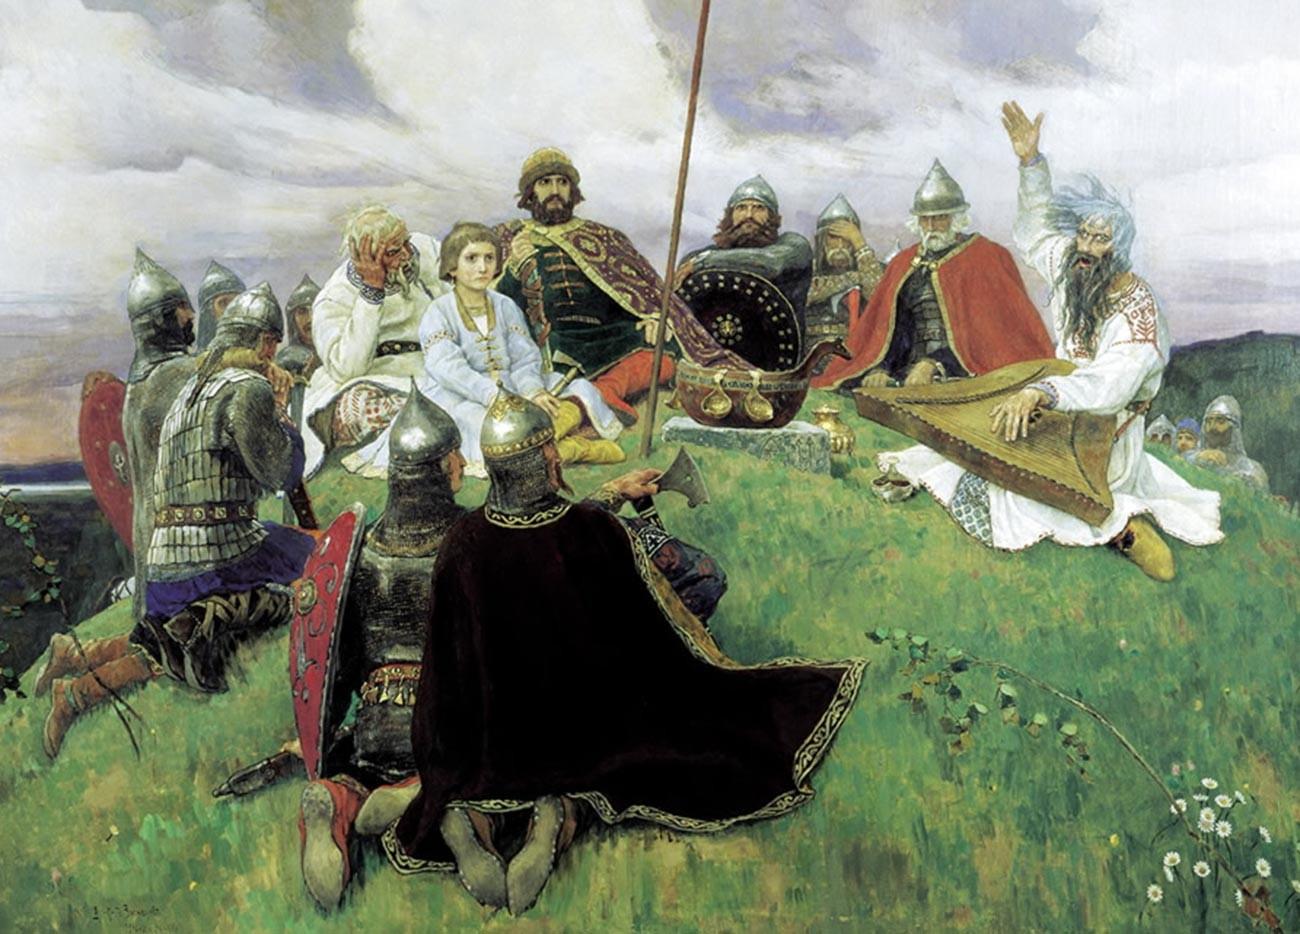 Autre tableau de Viktor Vasnetsov